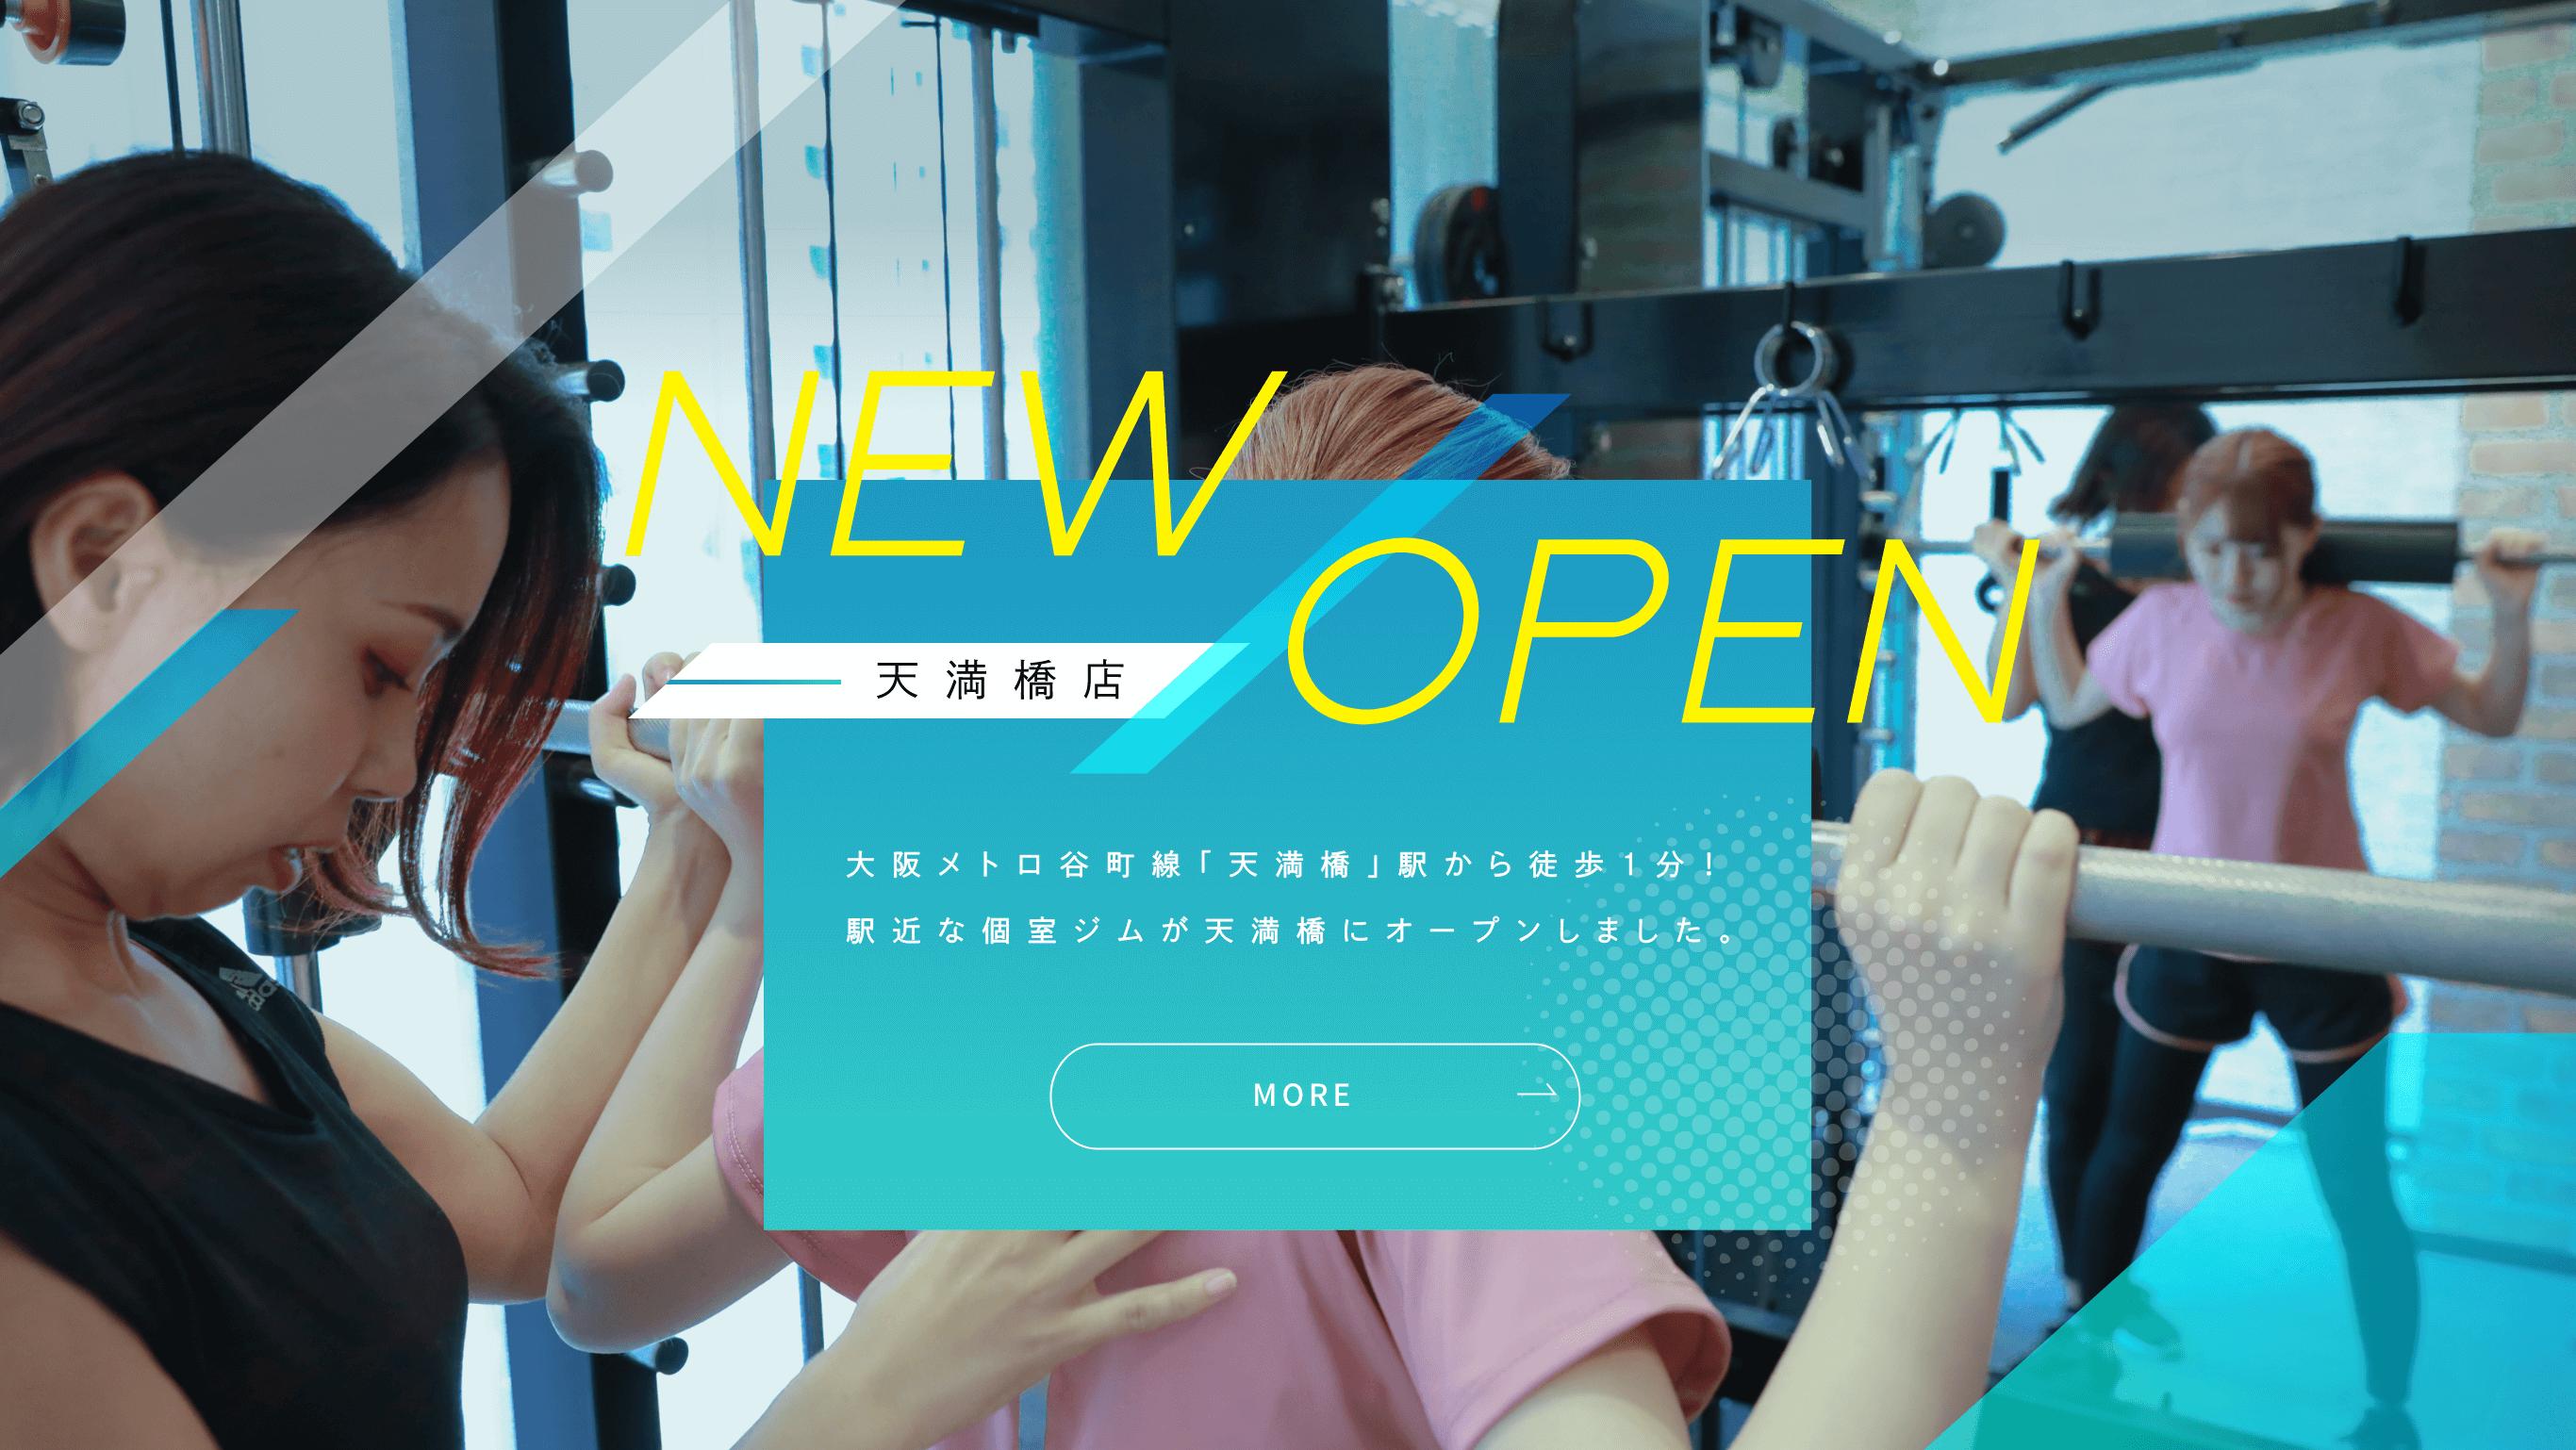 NEW OPEN 天満橋店 大阪メトロ谷町線「天満橋」駅から徒歩1分!<br>駅近な個室ジムが天満橋にオープンしました。